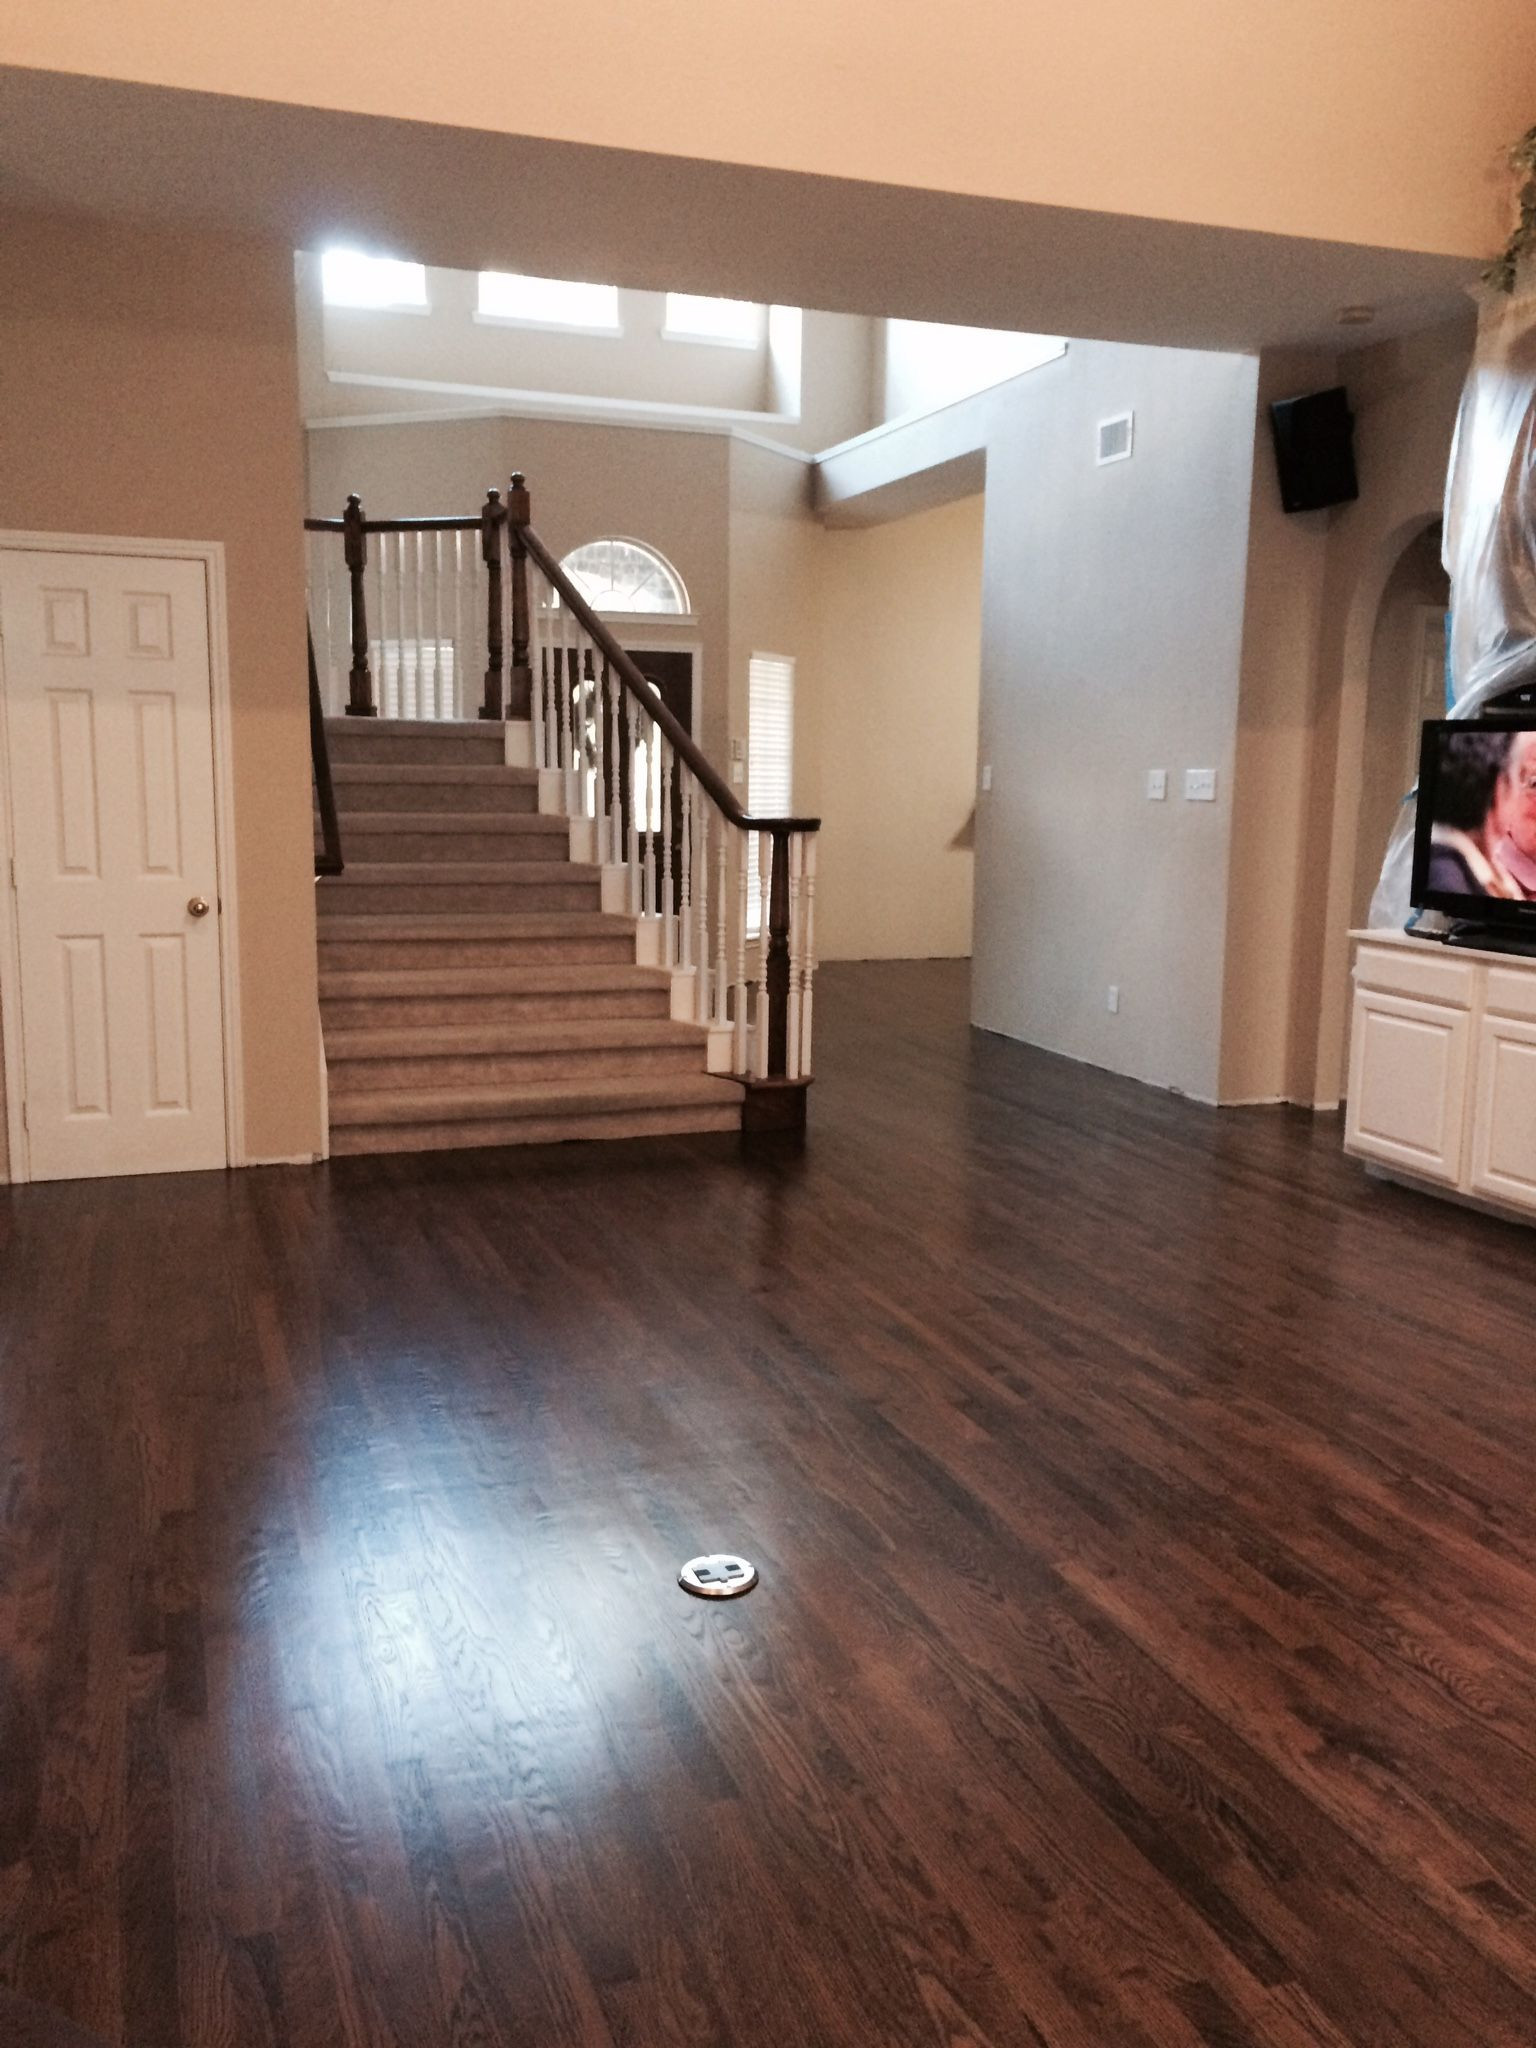 cheap hardwood floor installation of dark walnut stain on white oak hardwood remodel 1floors in 2018 with regard to dark walnut stain on white oak hardwood walnut hardwood flooring hardwood floor stain colors